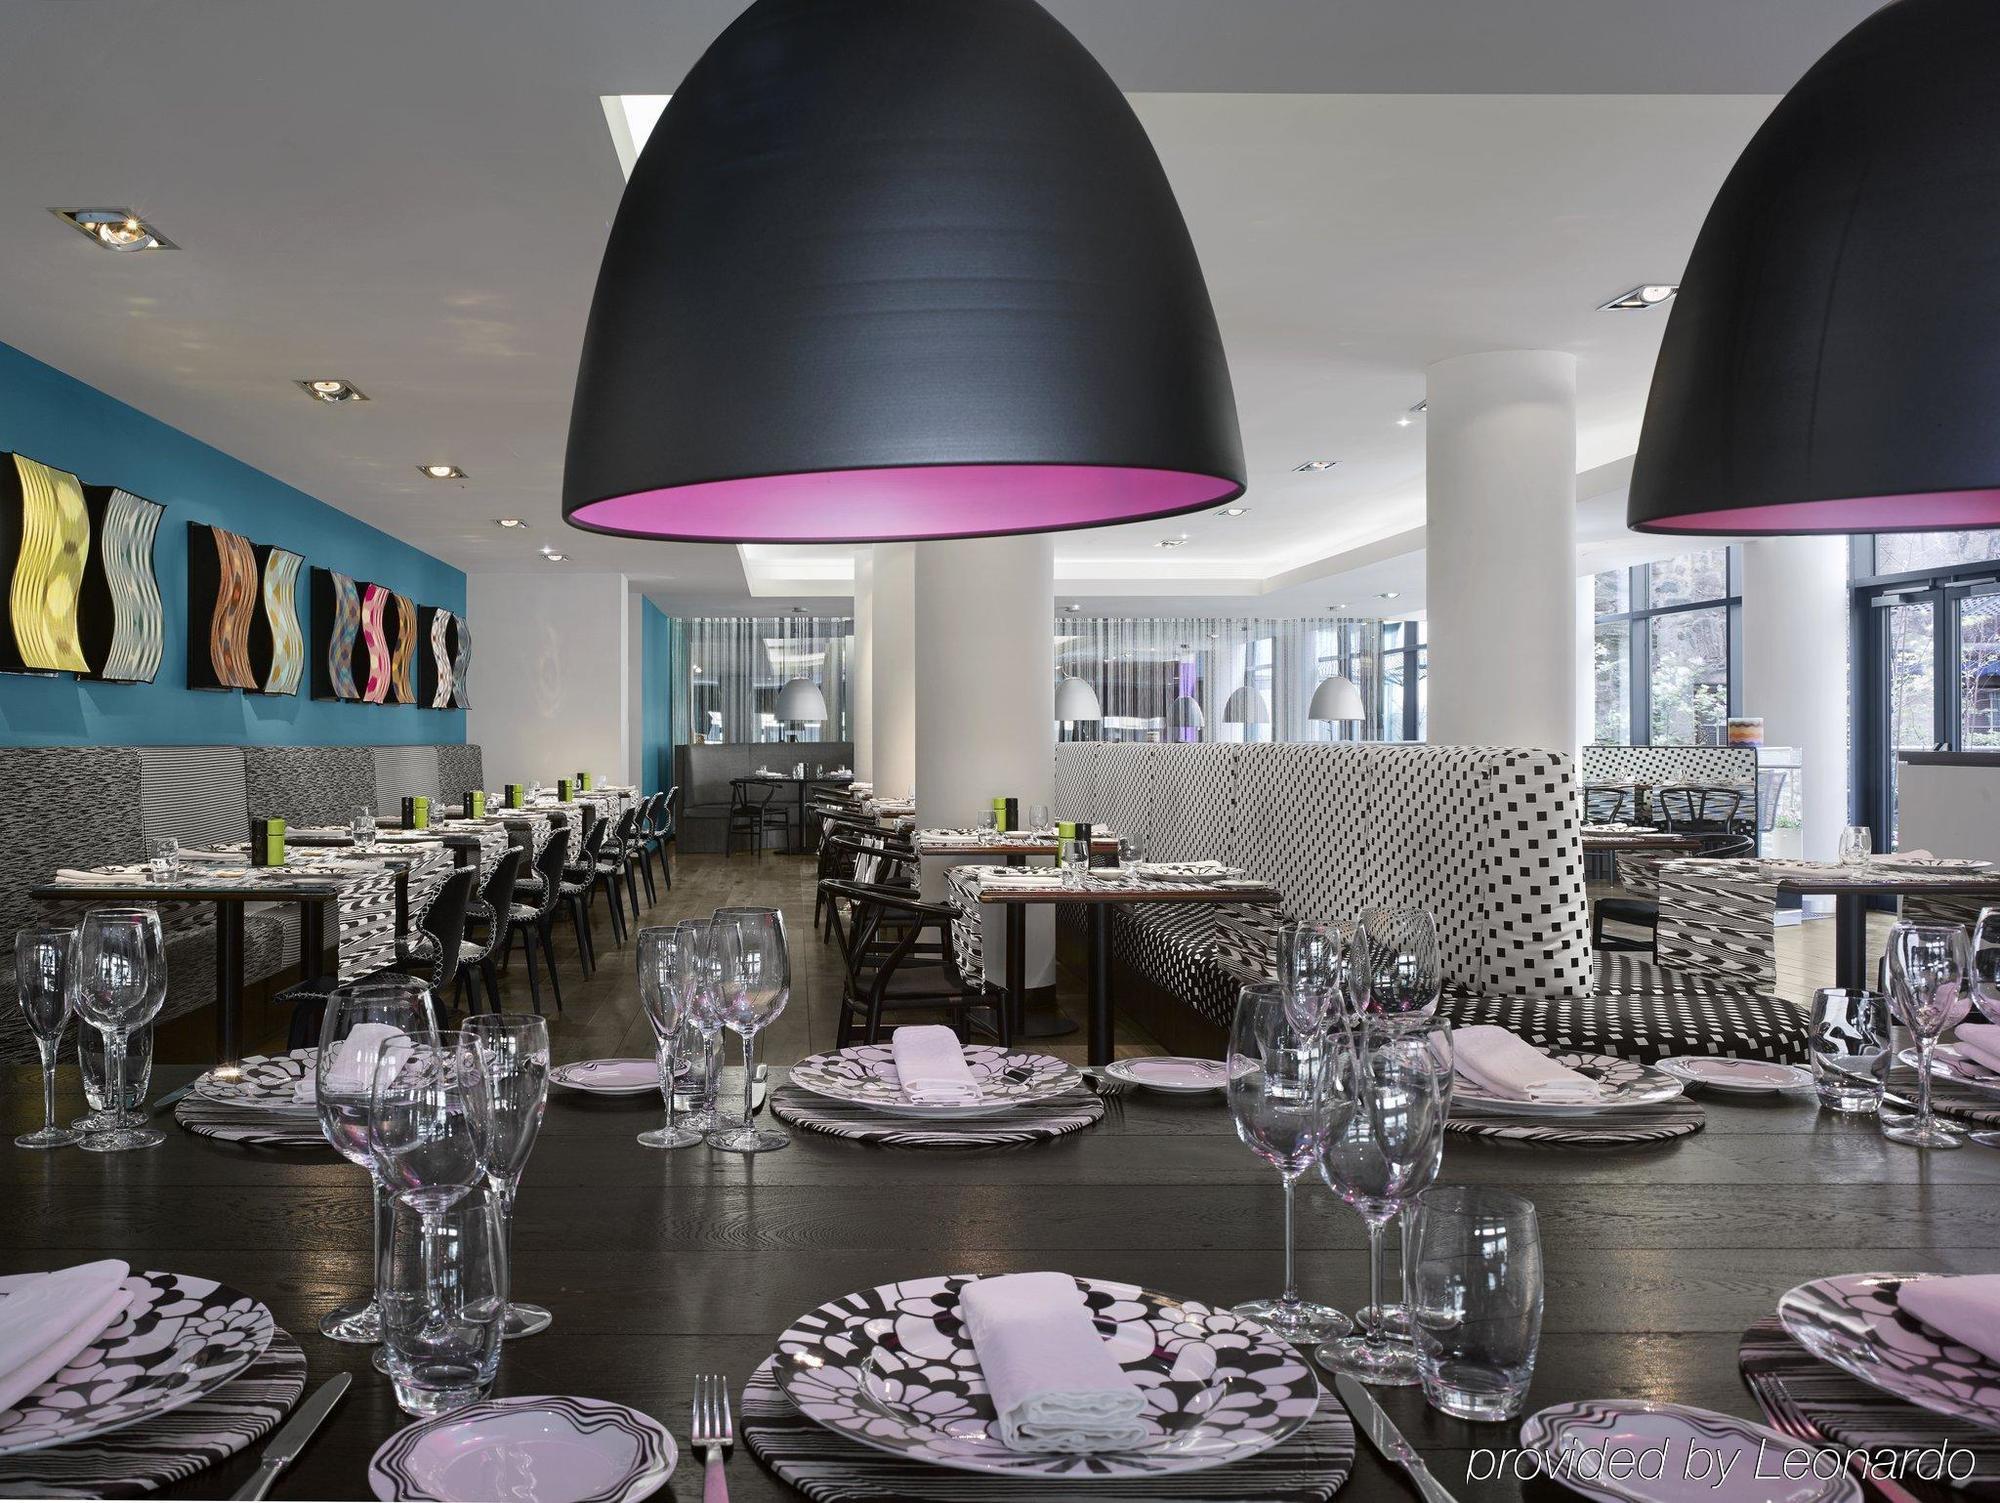 G v royal mile hotel edinburgh edinburgh for Cucina g v hotel